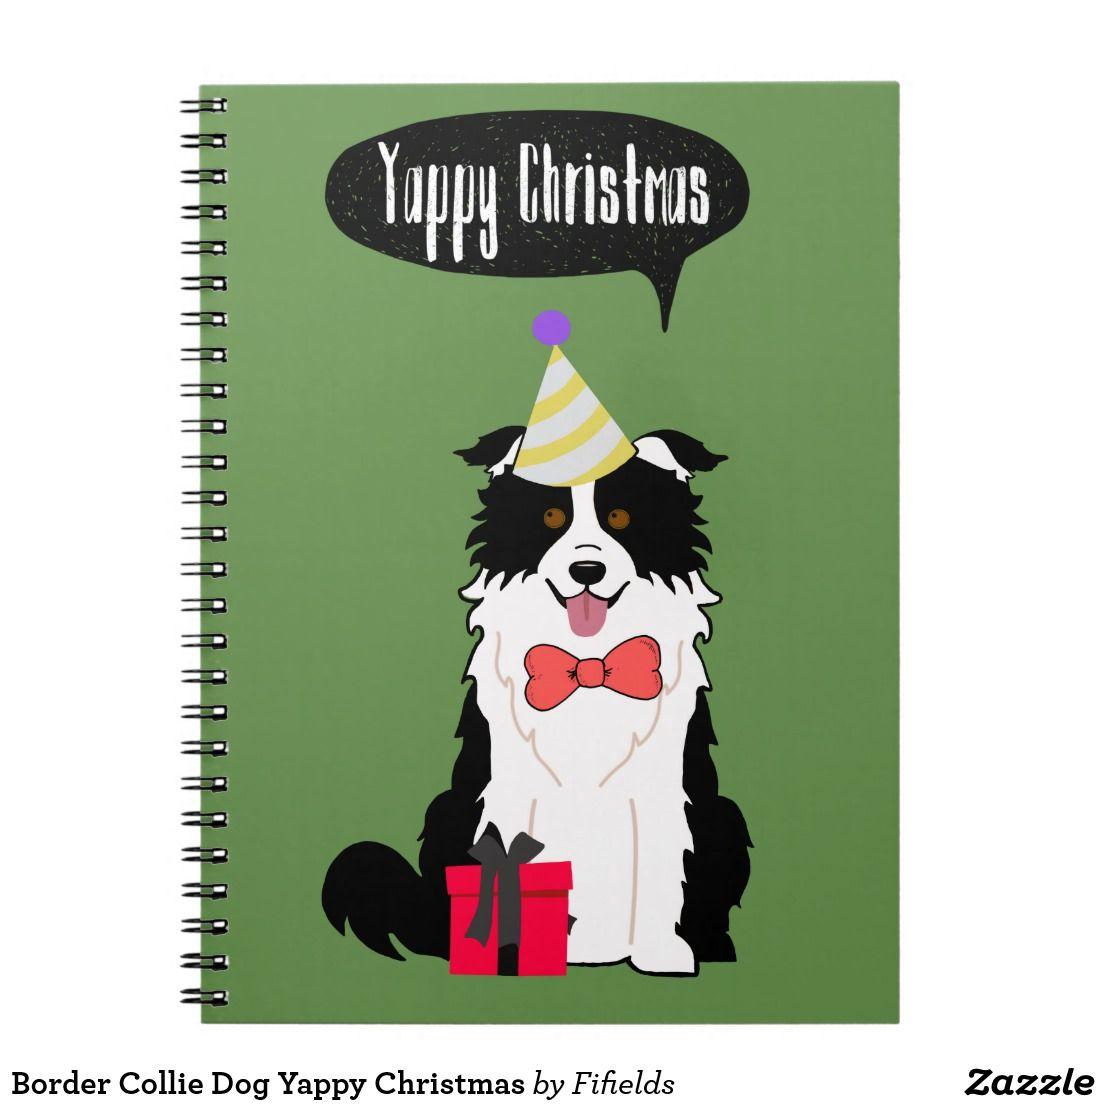 Border Collie Dog Yappy Christmas Notebook Zazzle Co Uk Collie